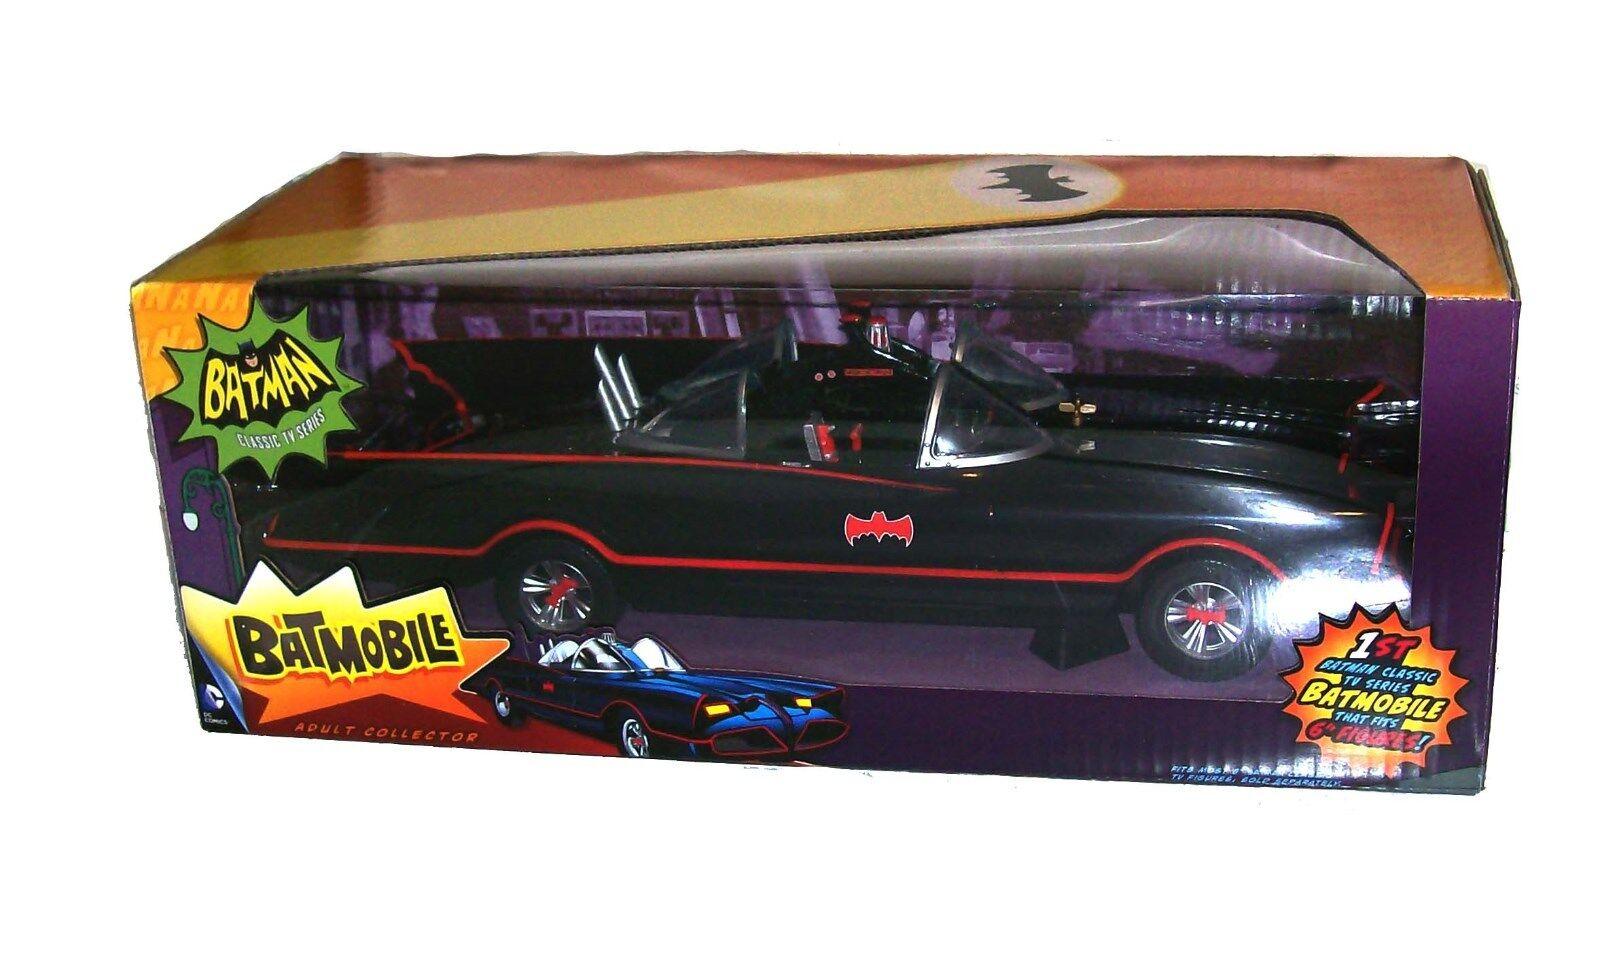 Dc comics batman klassische tv - show - reihe das batmobil auto mattel